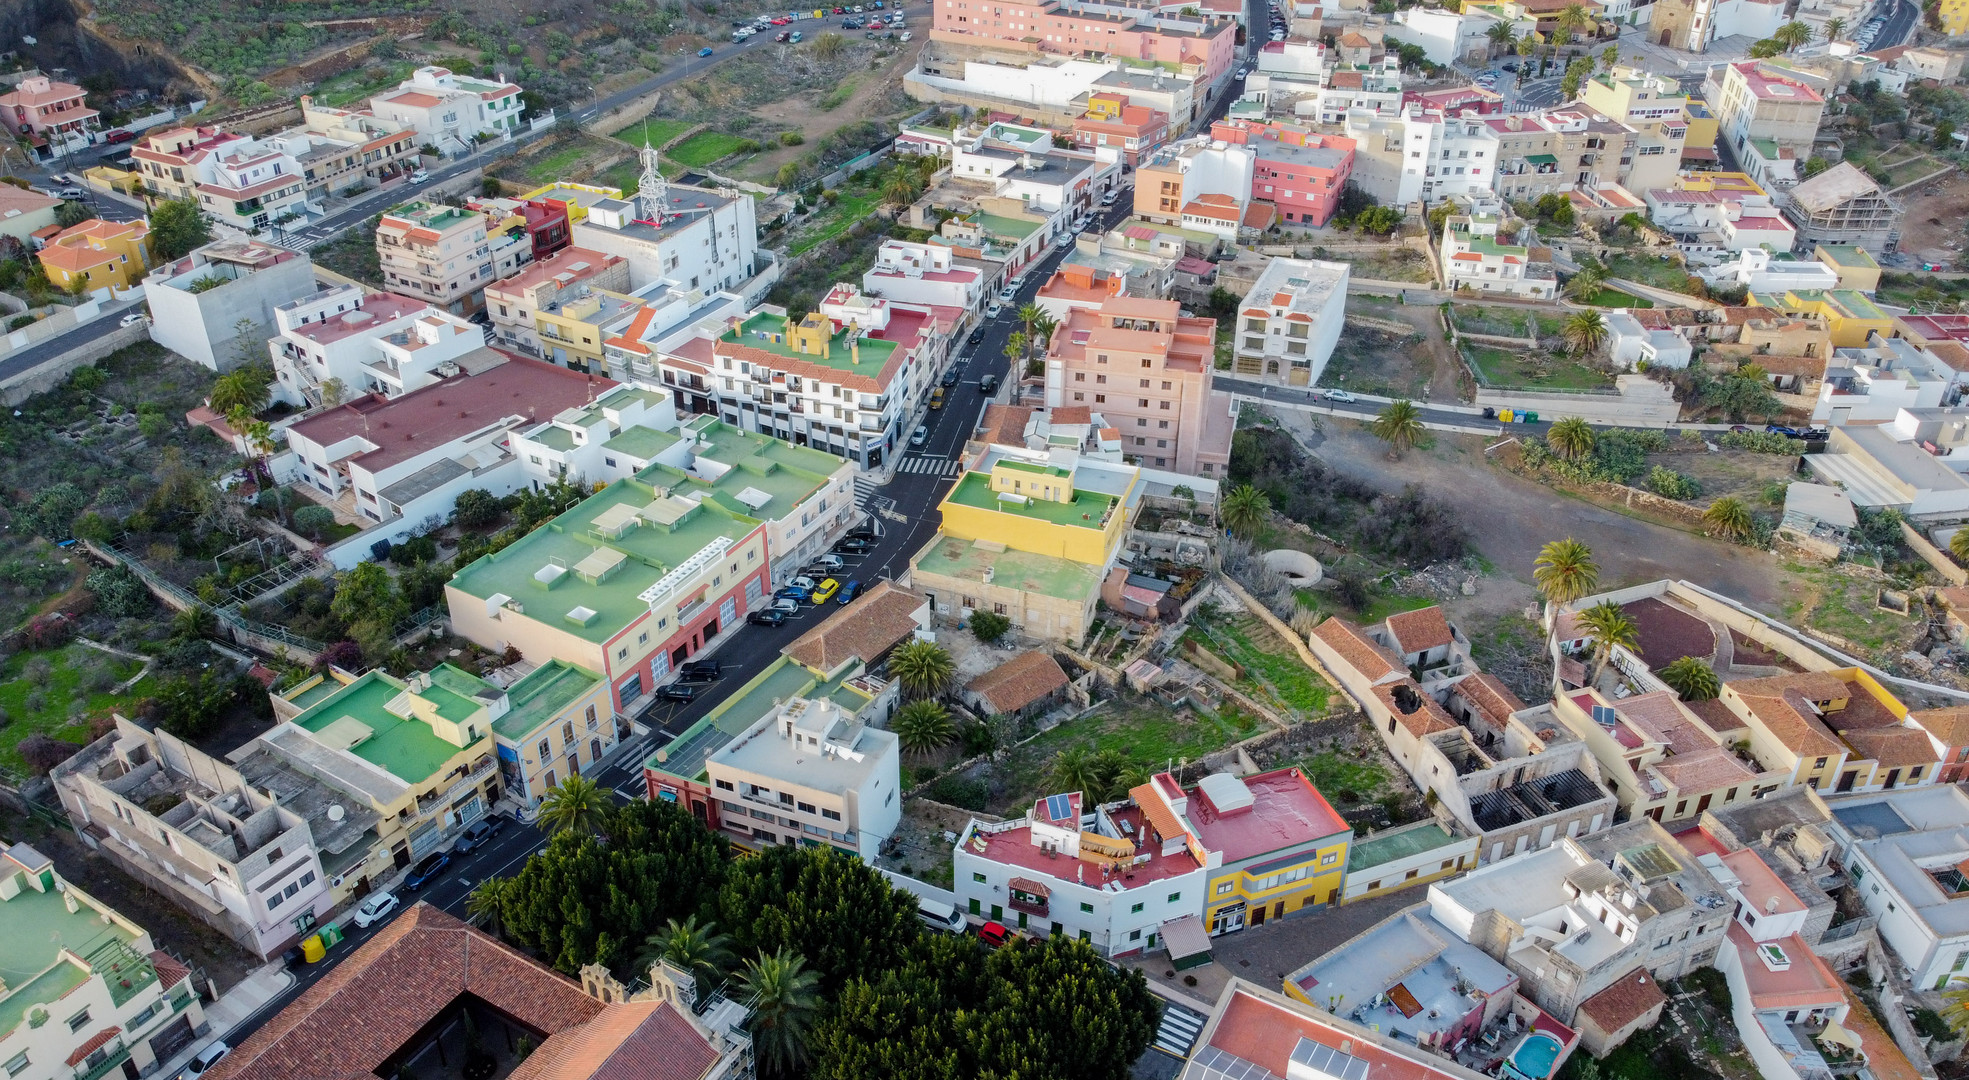 Drone shot of Granadilla de Abona Tenerife